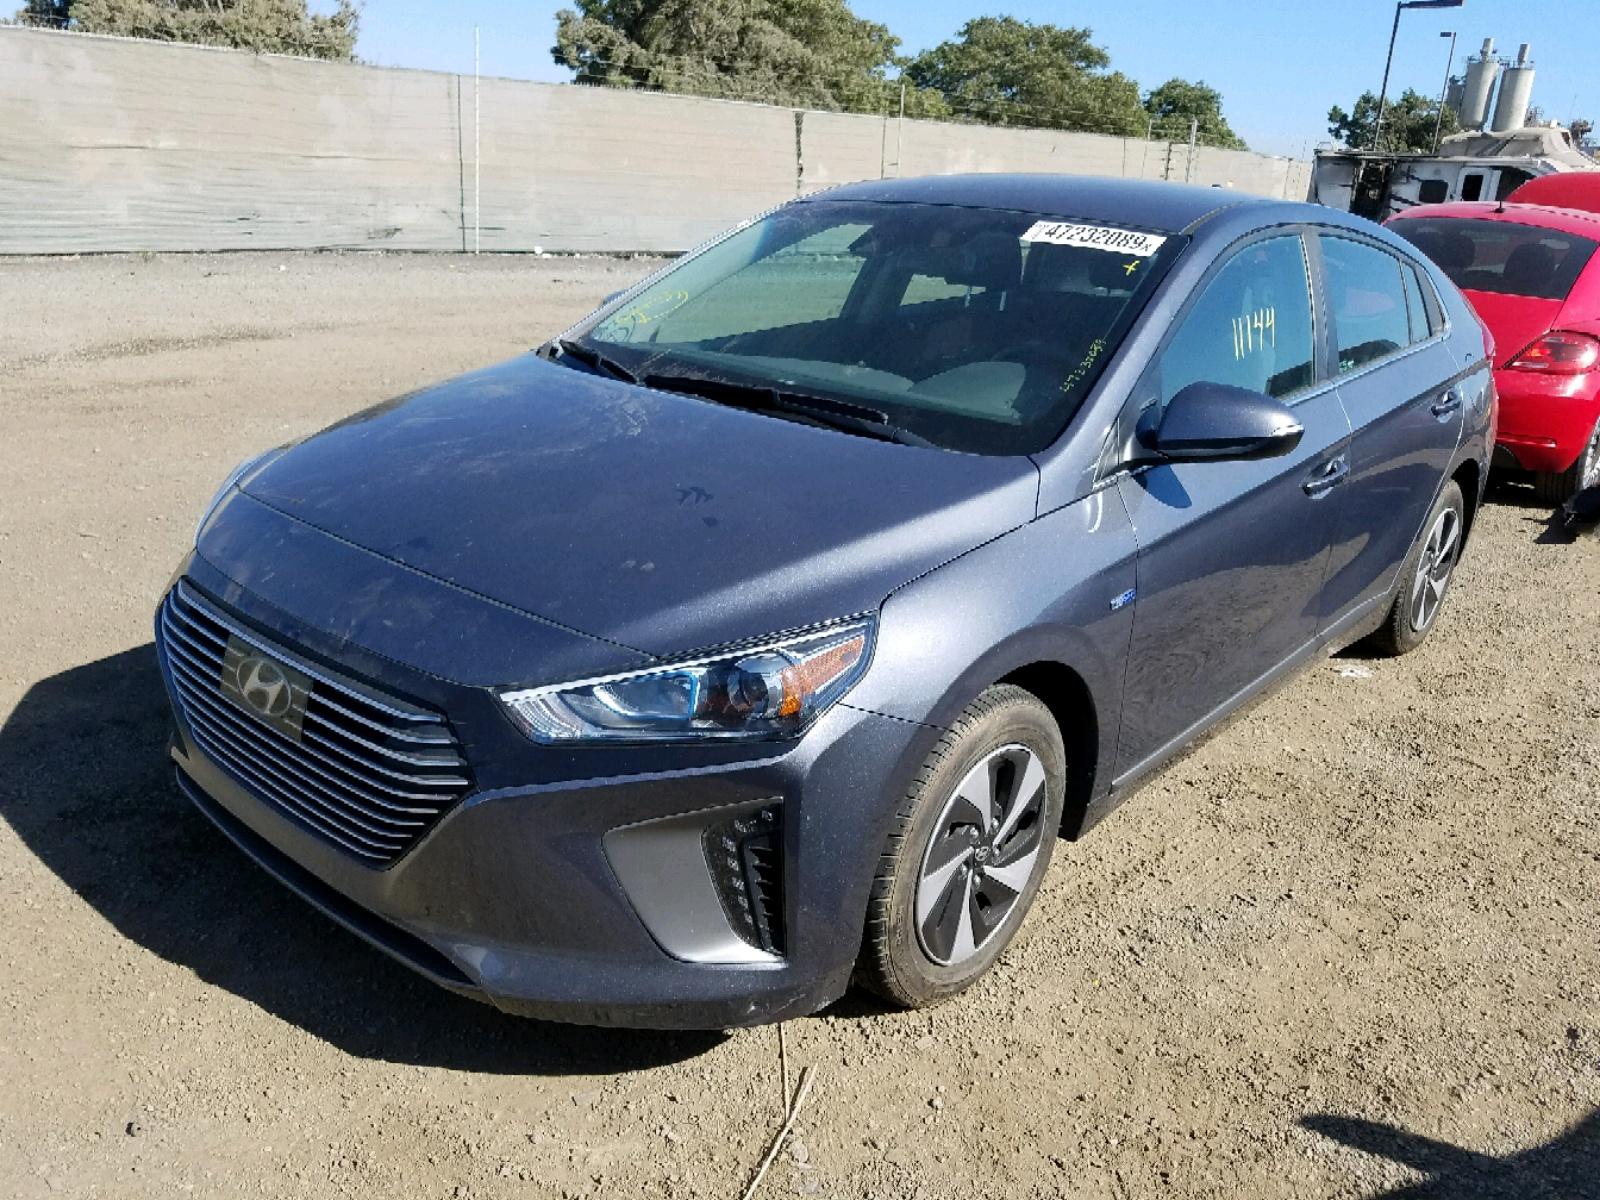 KMHC75LC2HU028247 - 2017 Hyundai Ioniq Sel 1.6L Right View